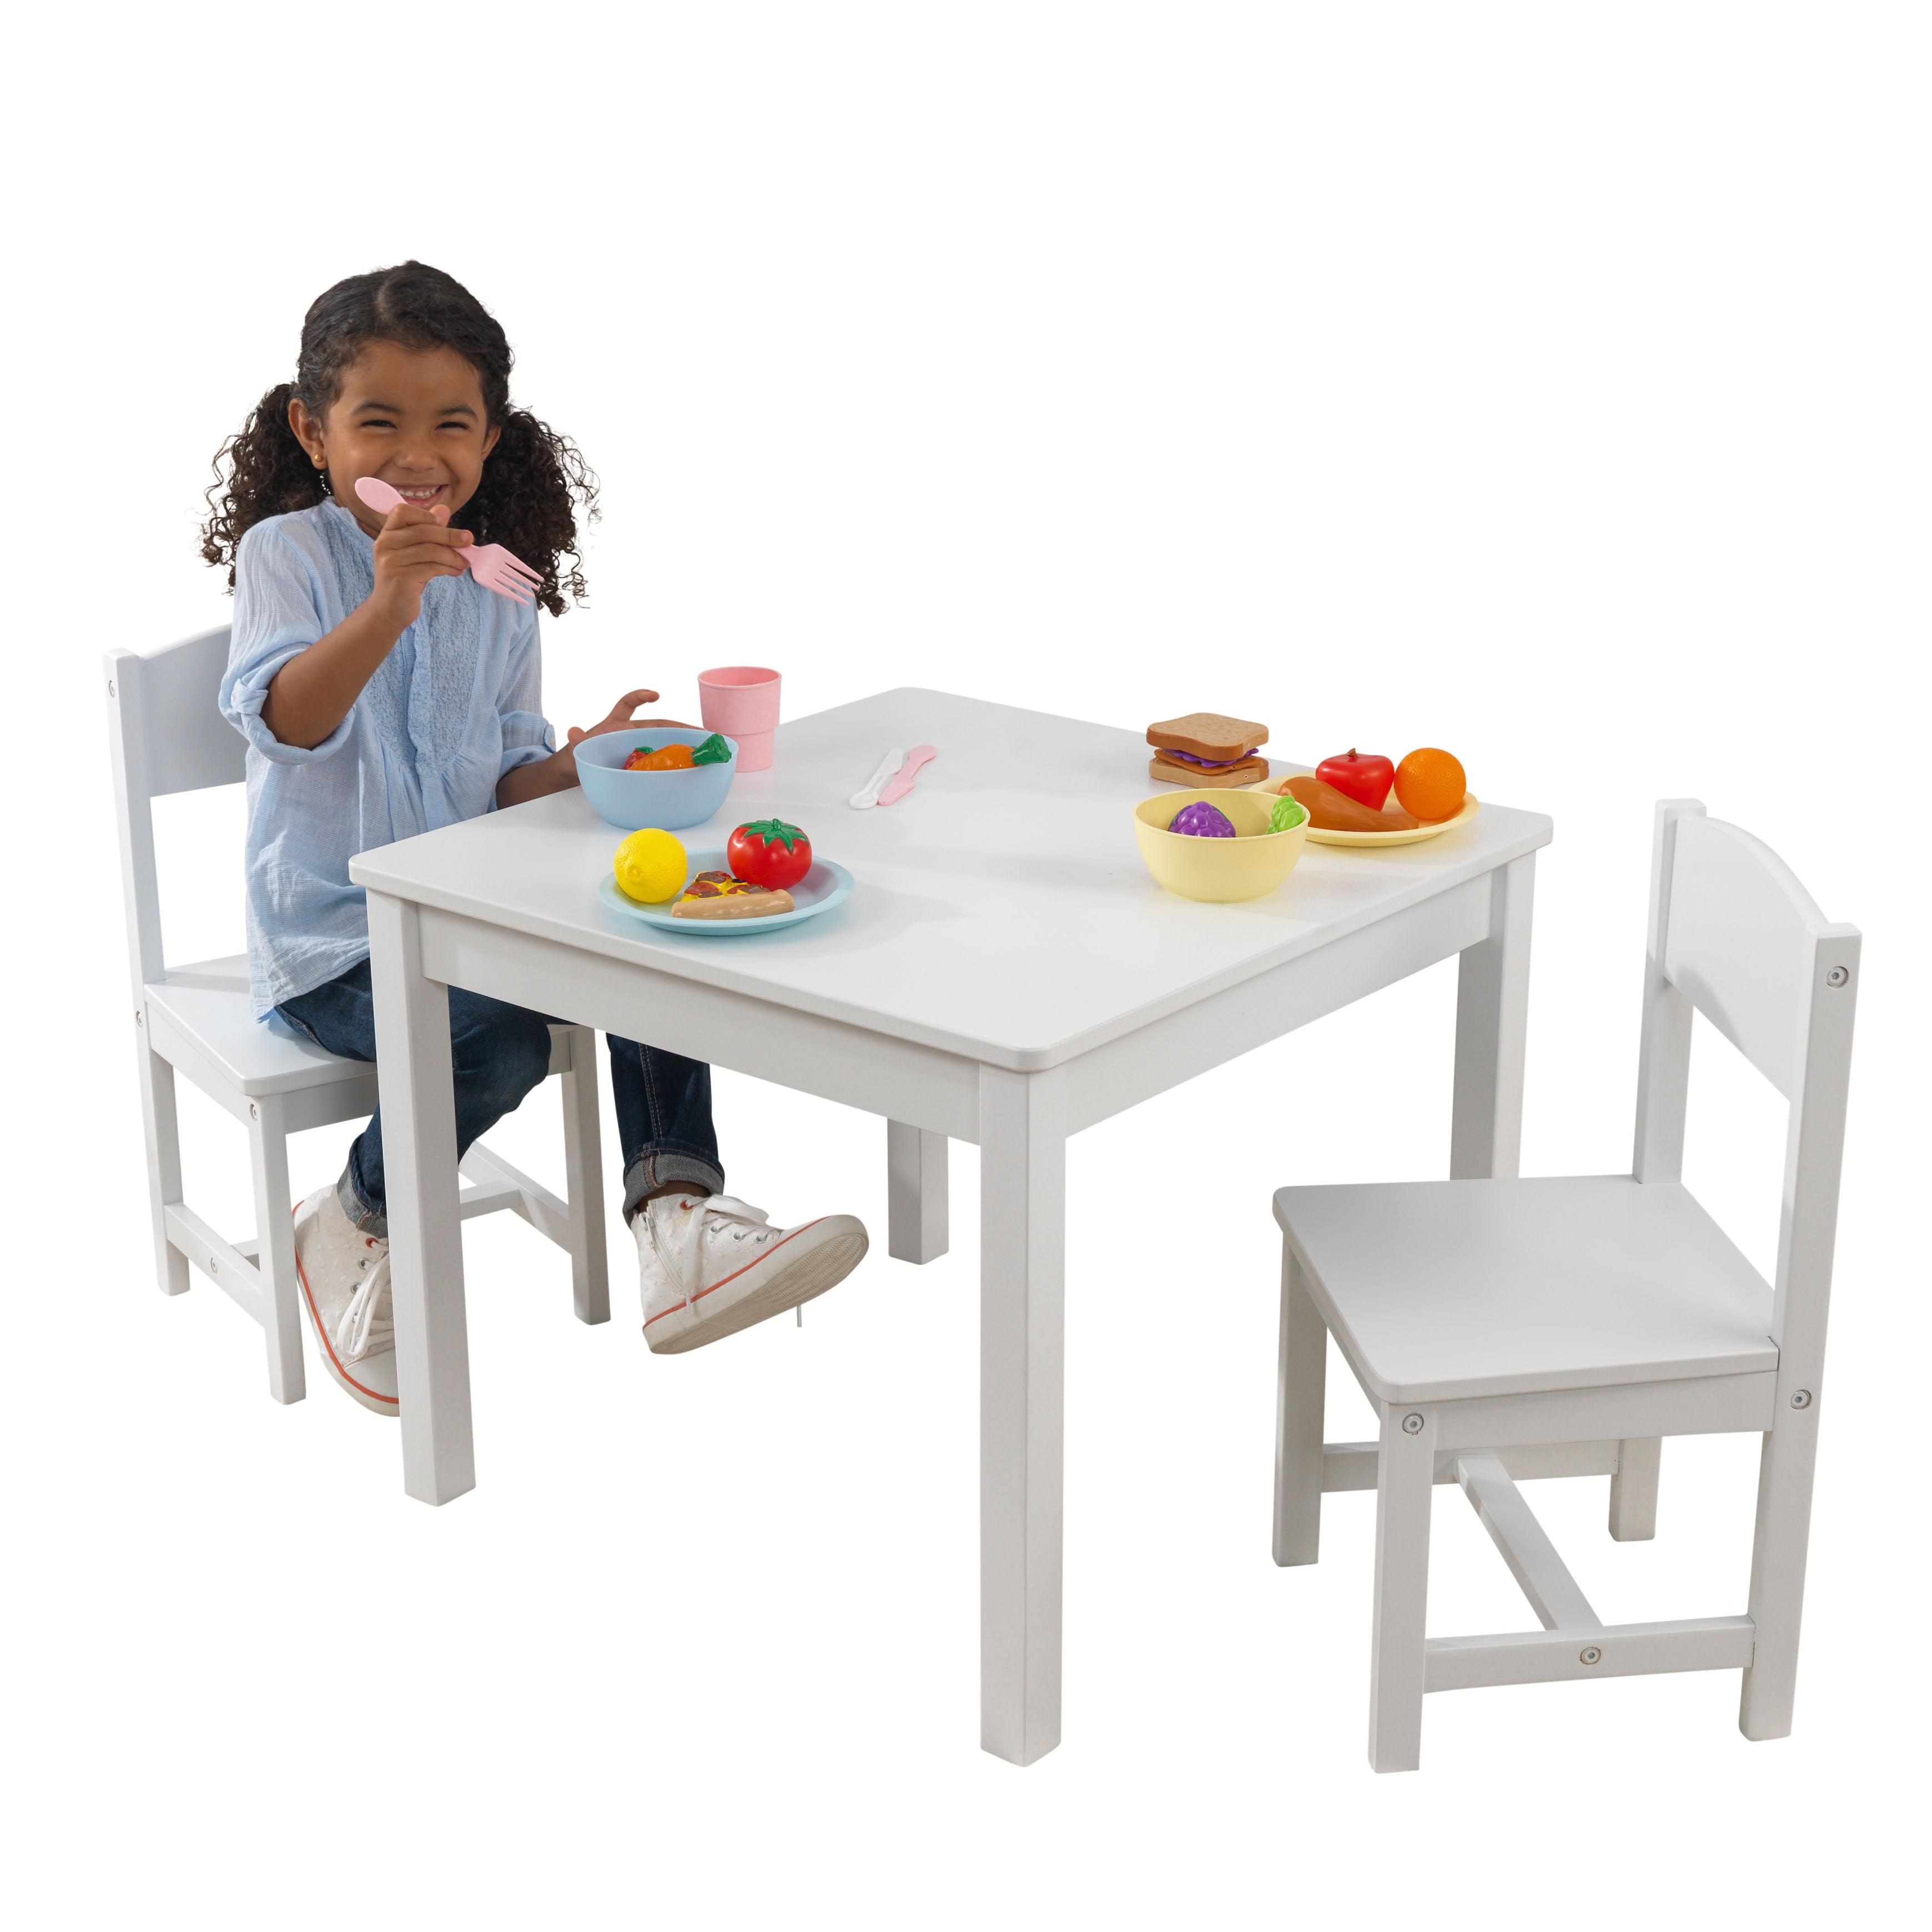 KidKraft Aspen Table & 2 Chair Set, Multiple Colors by KidKraft